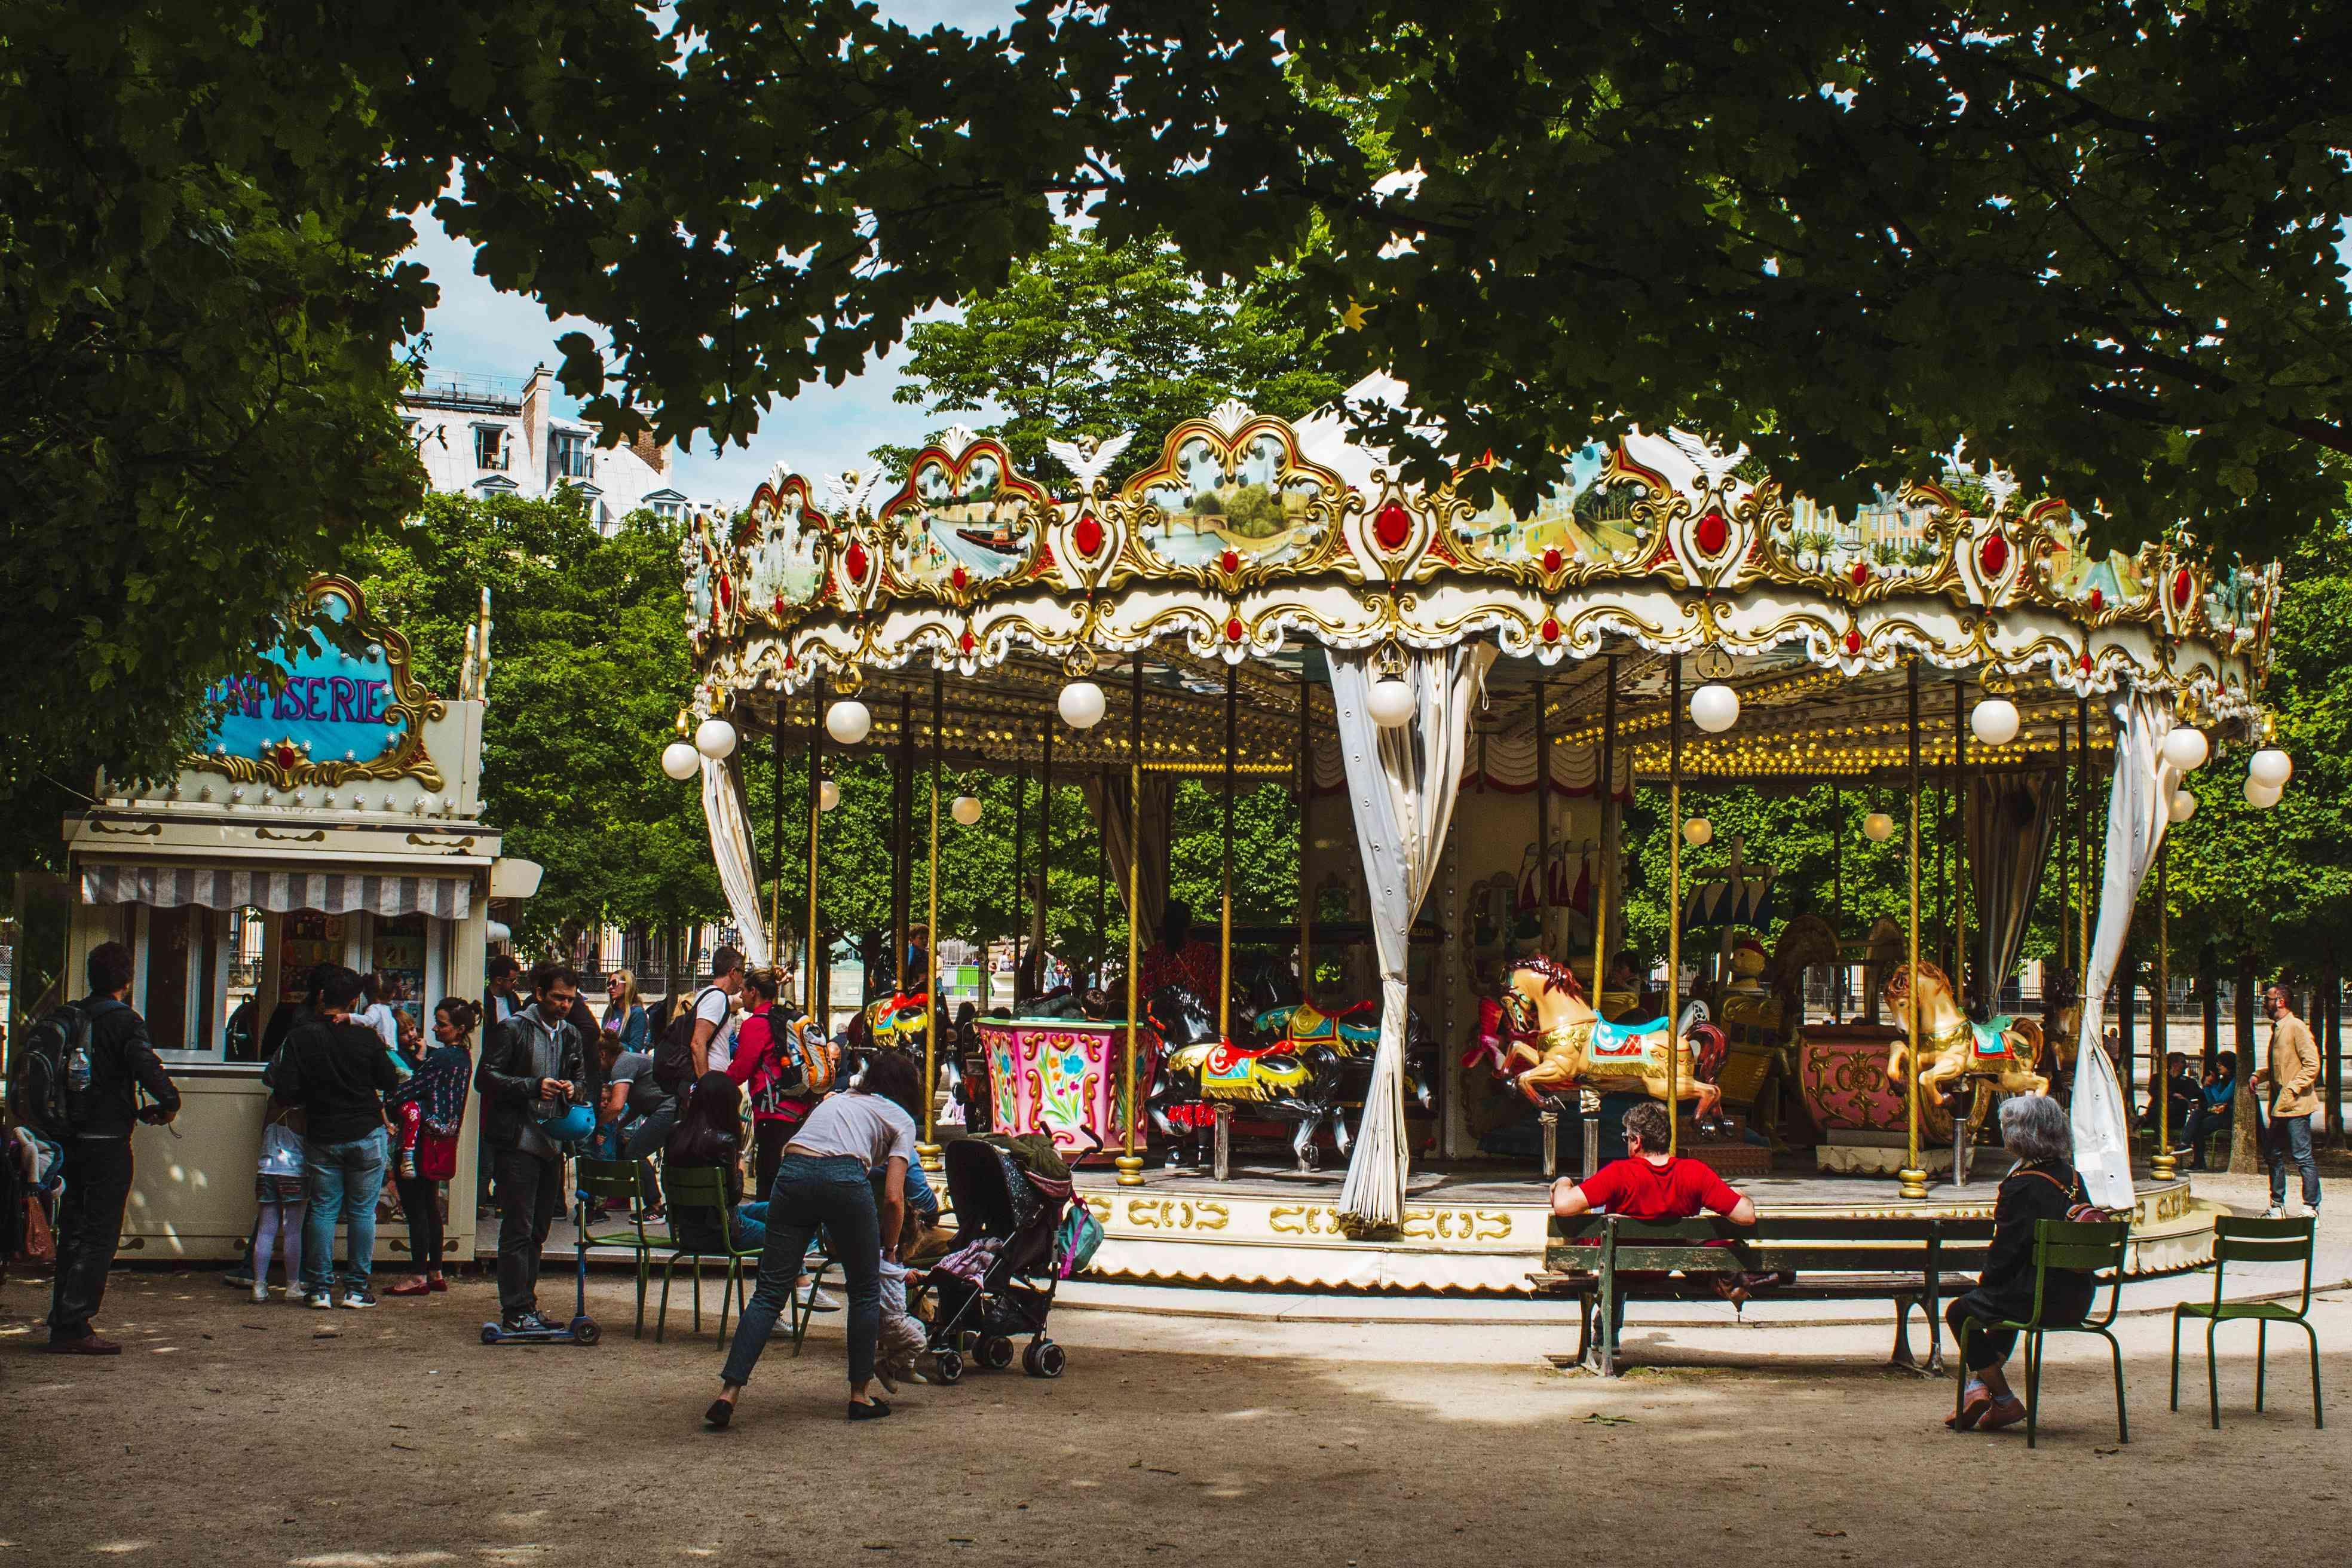 Carousel in Jardin des Tuileries